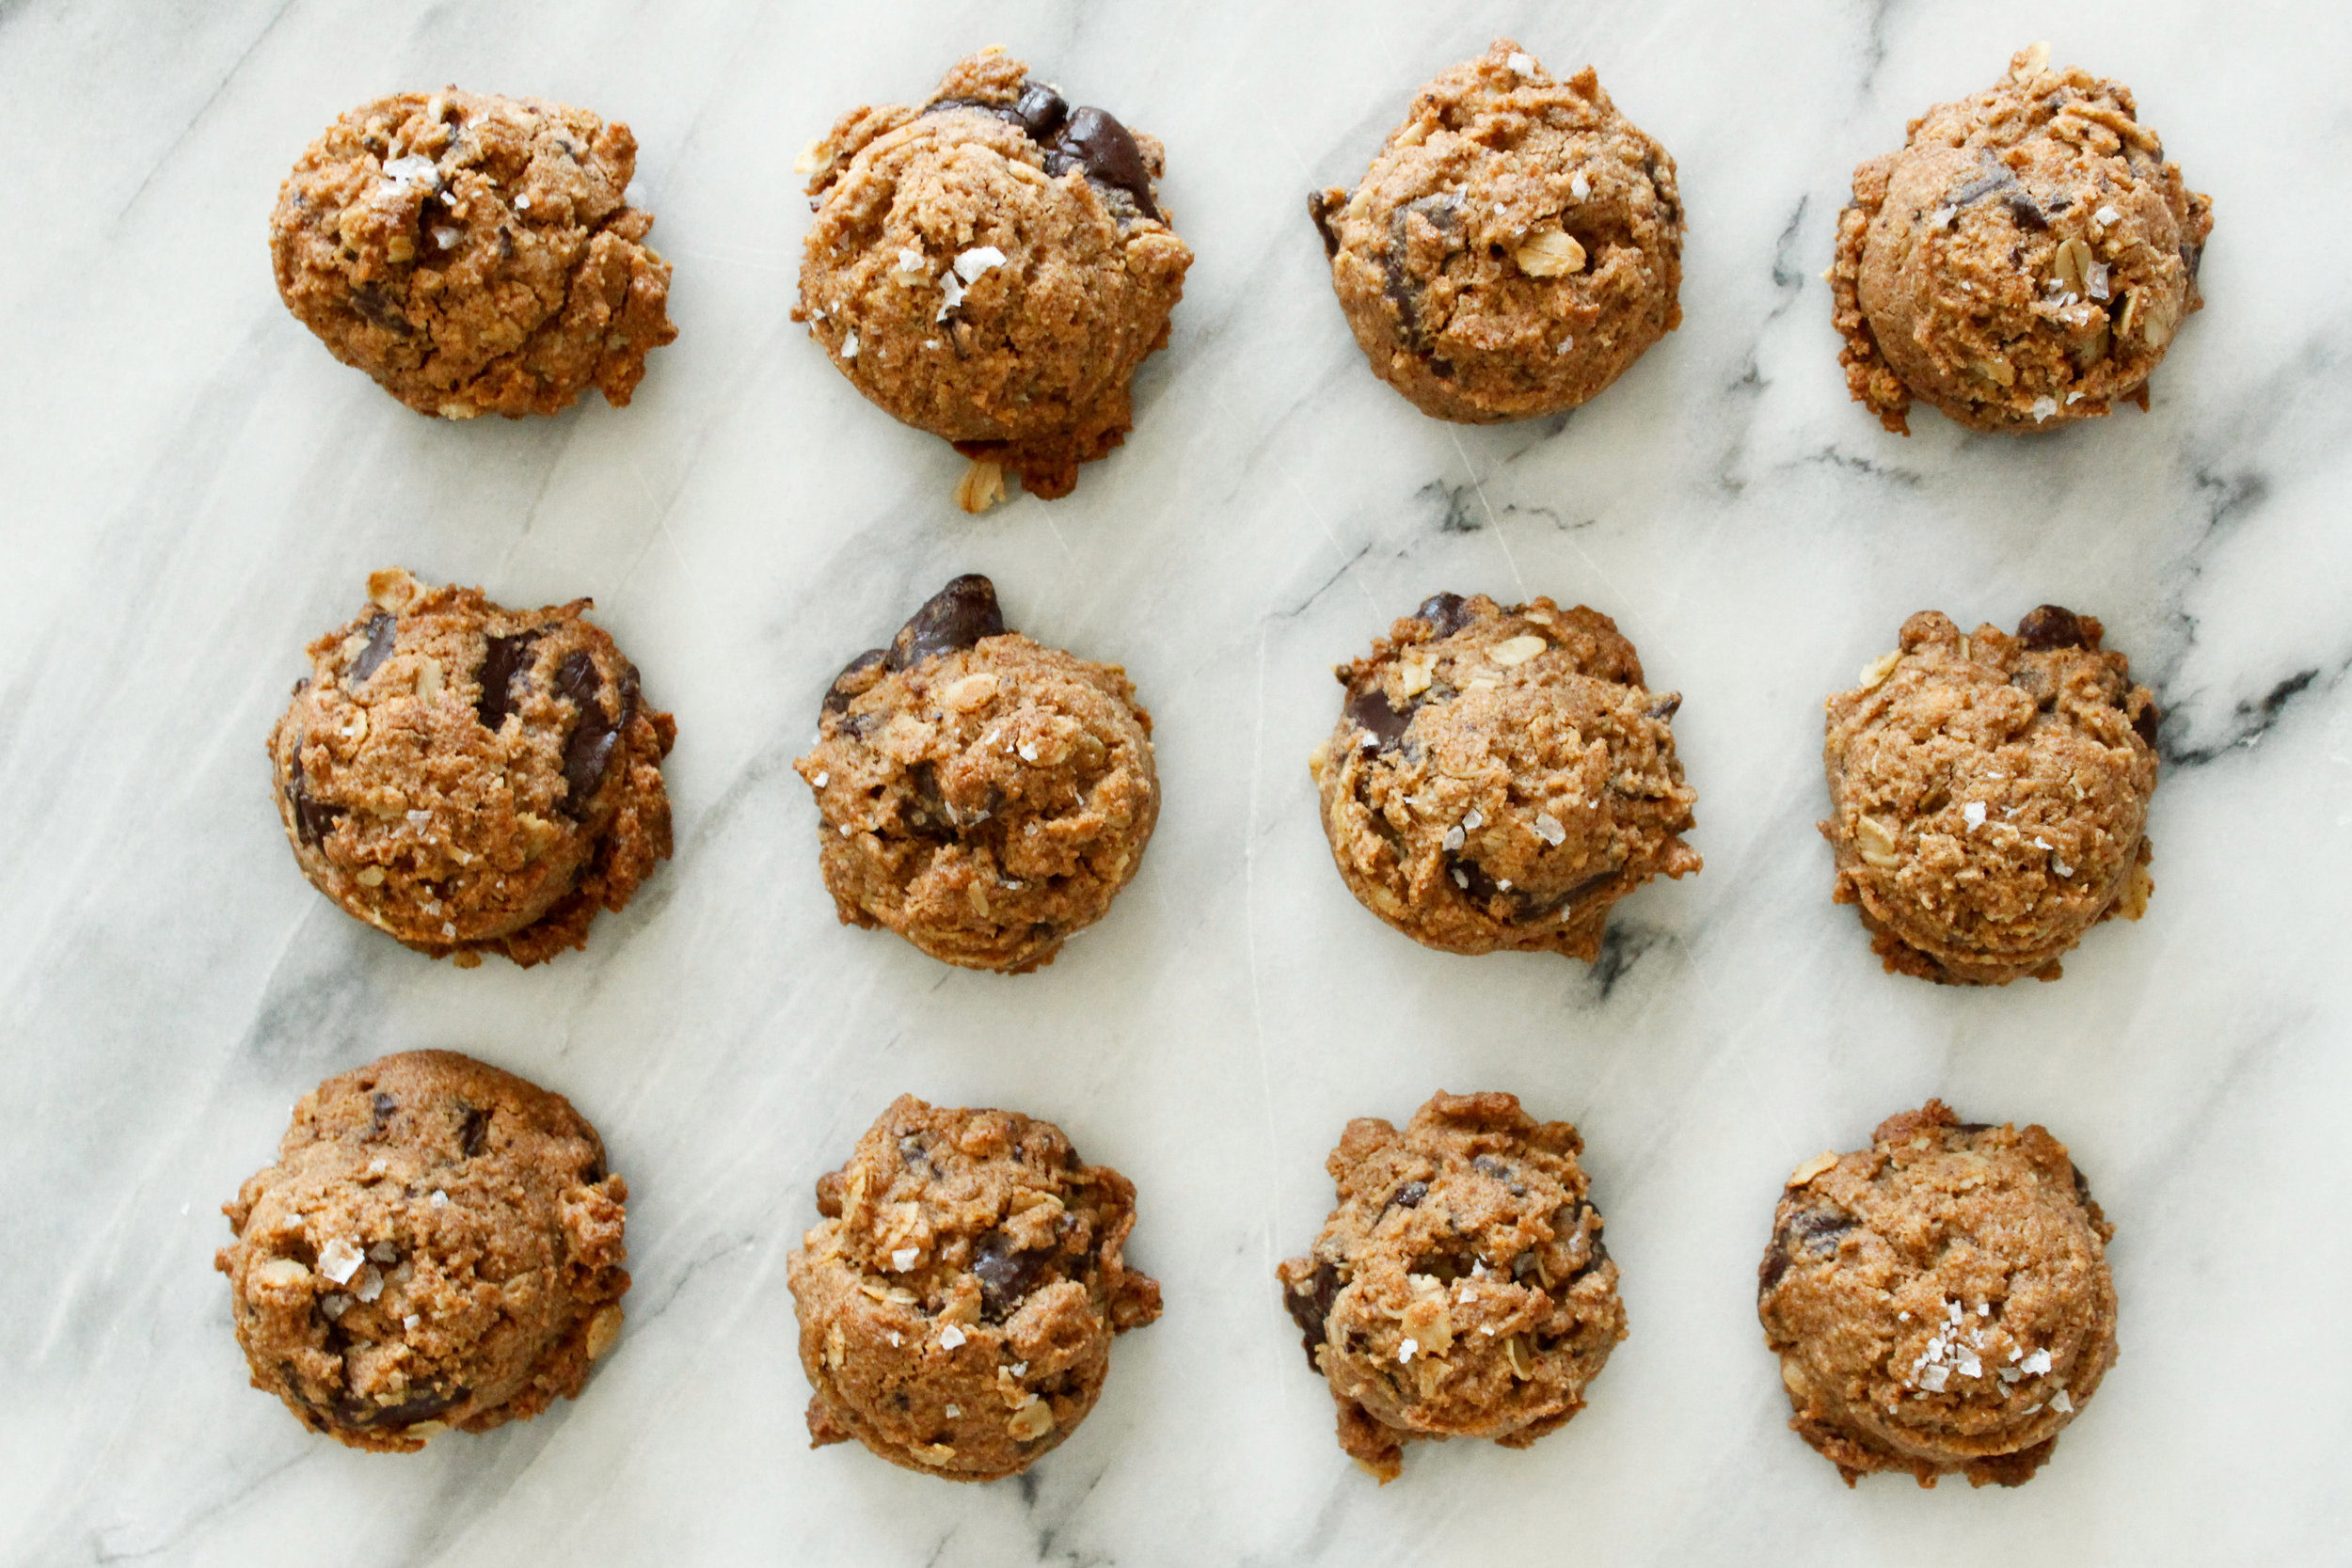 GF/Vegan Chocolate Chip Cookies